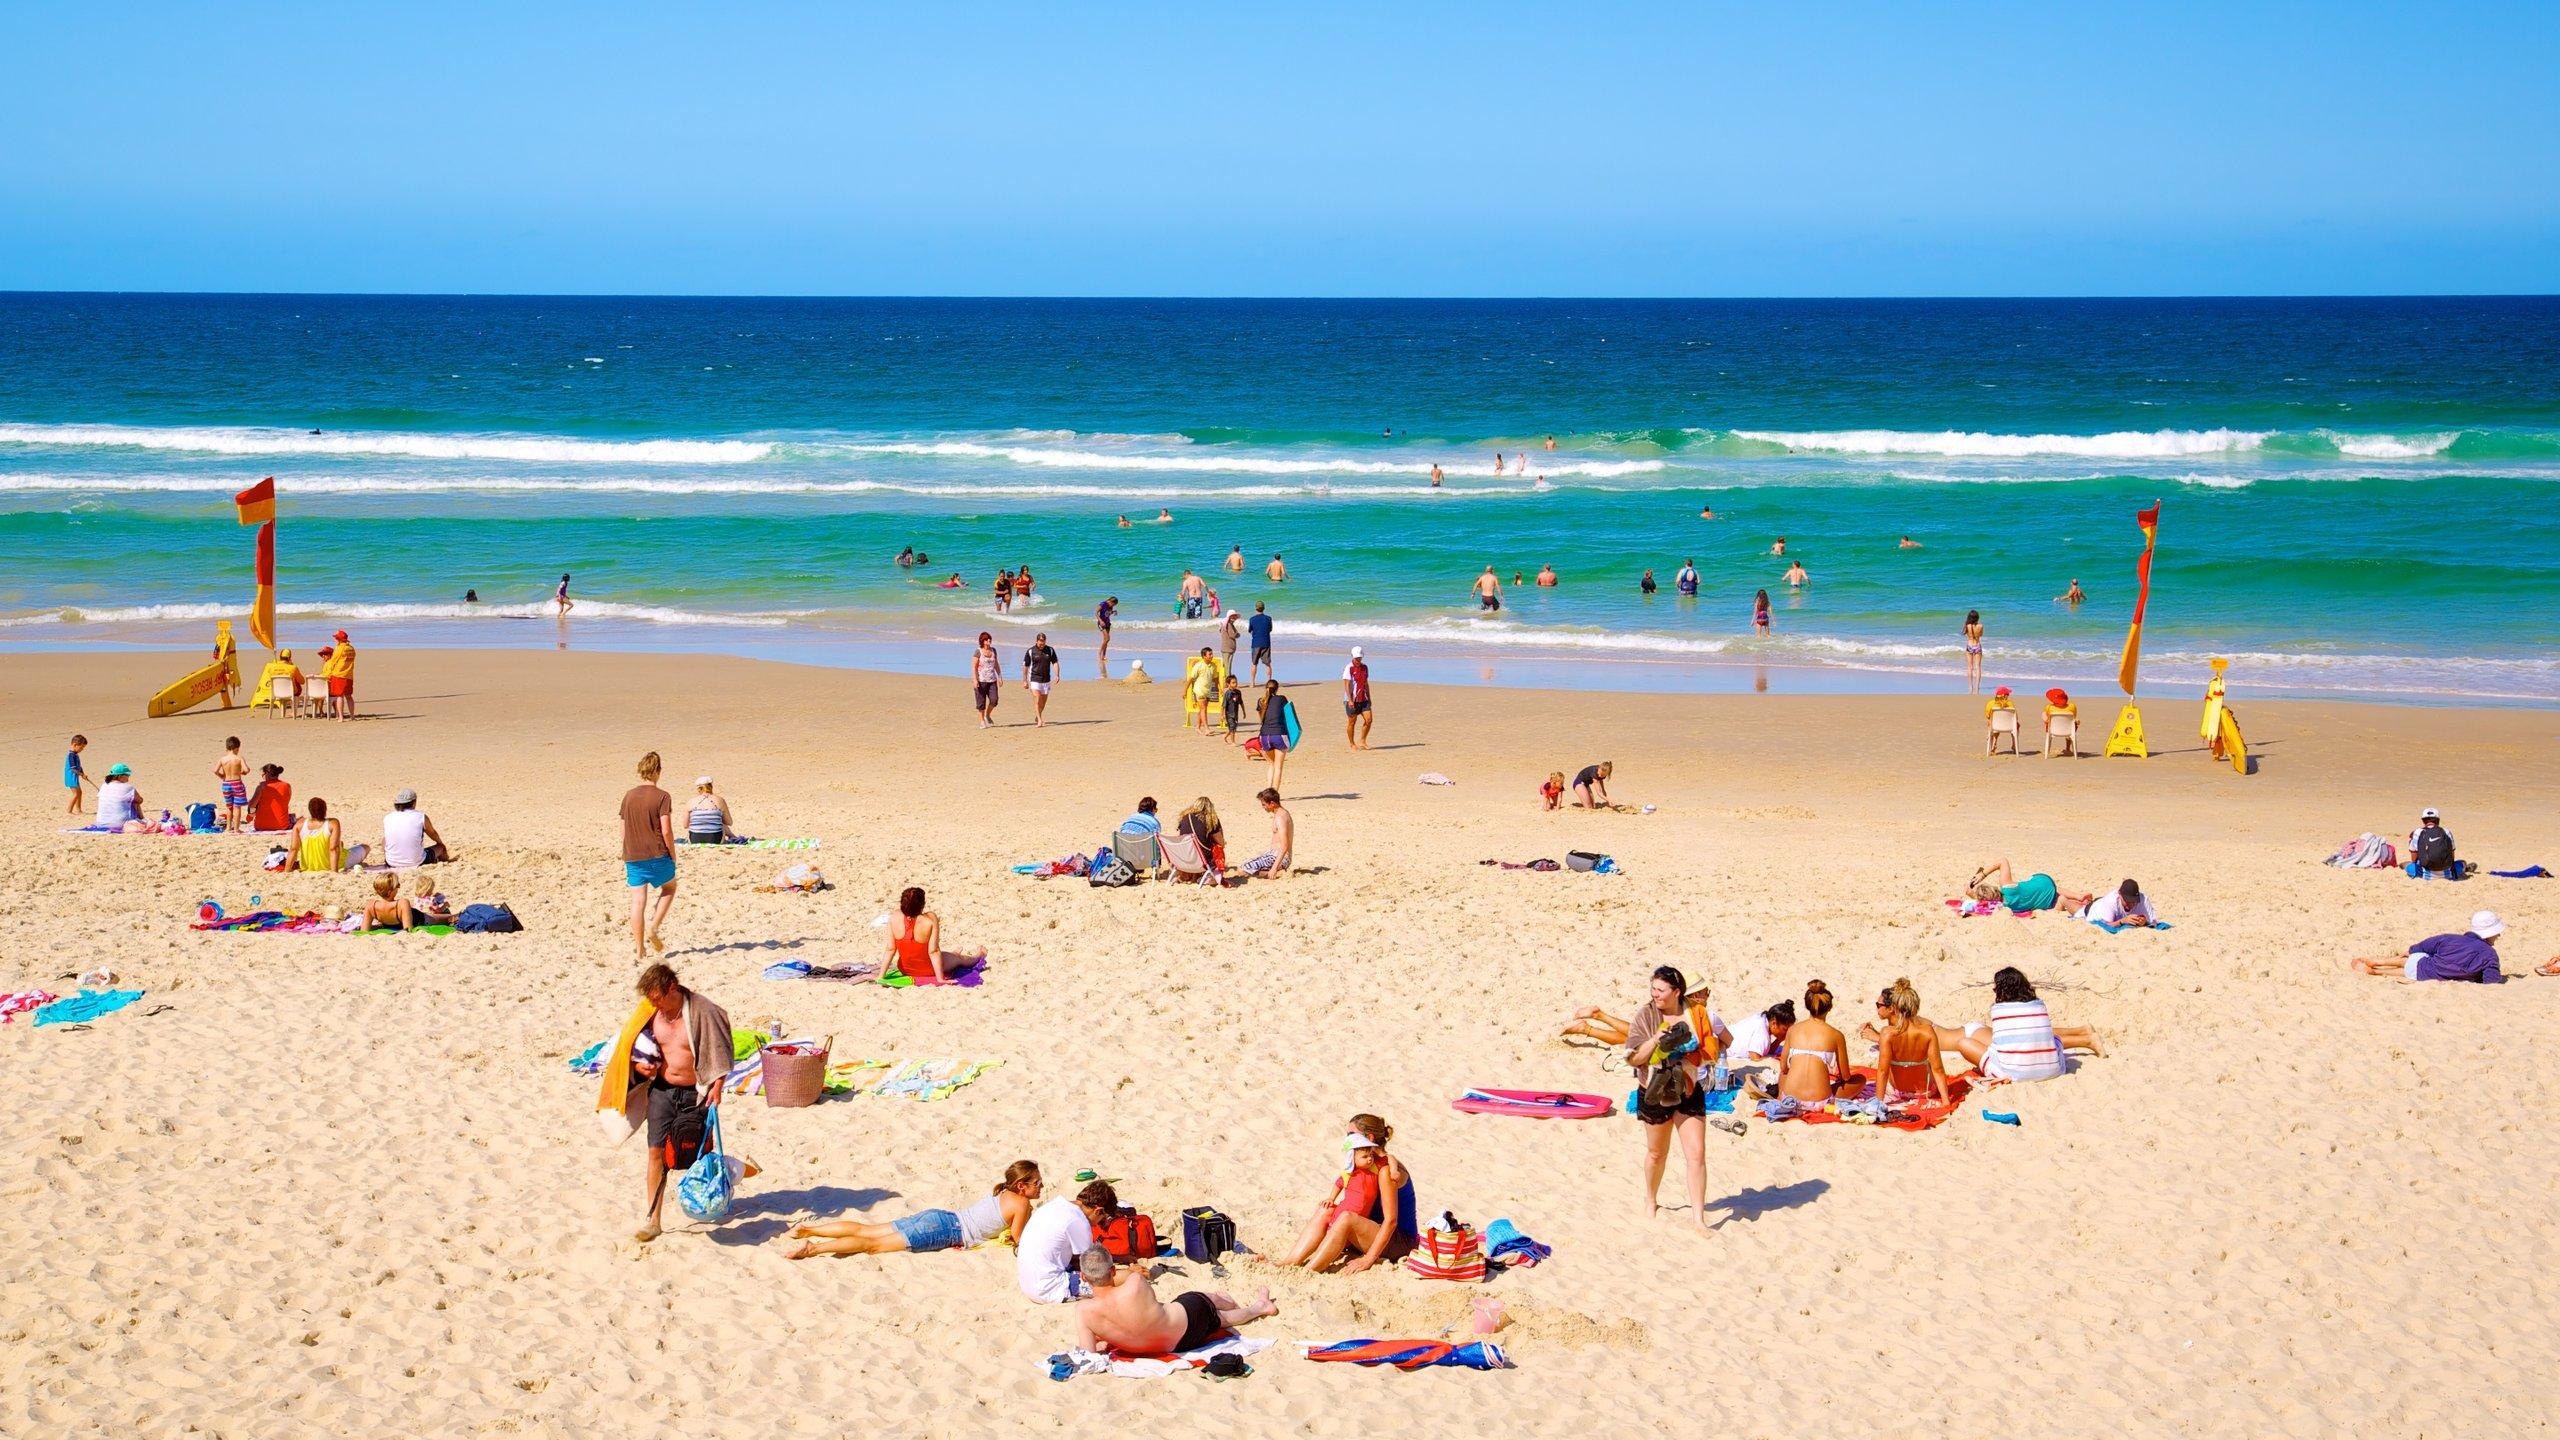 Main Beach, Gold Coast, Queensland, Australia